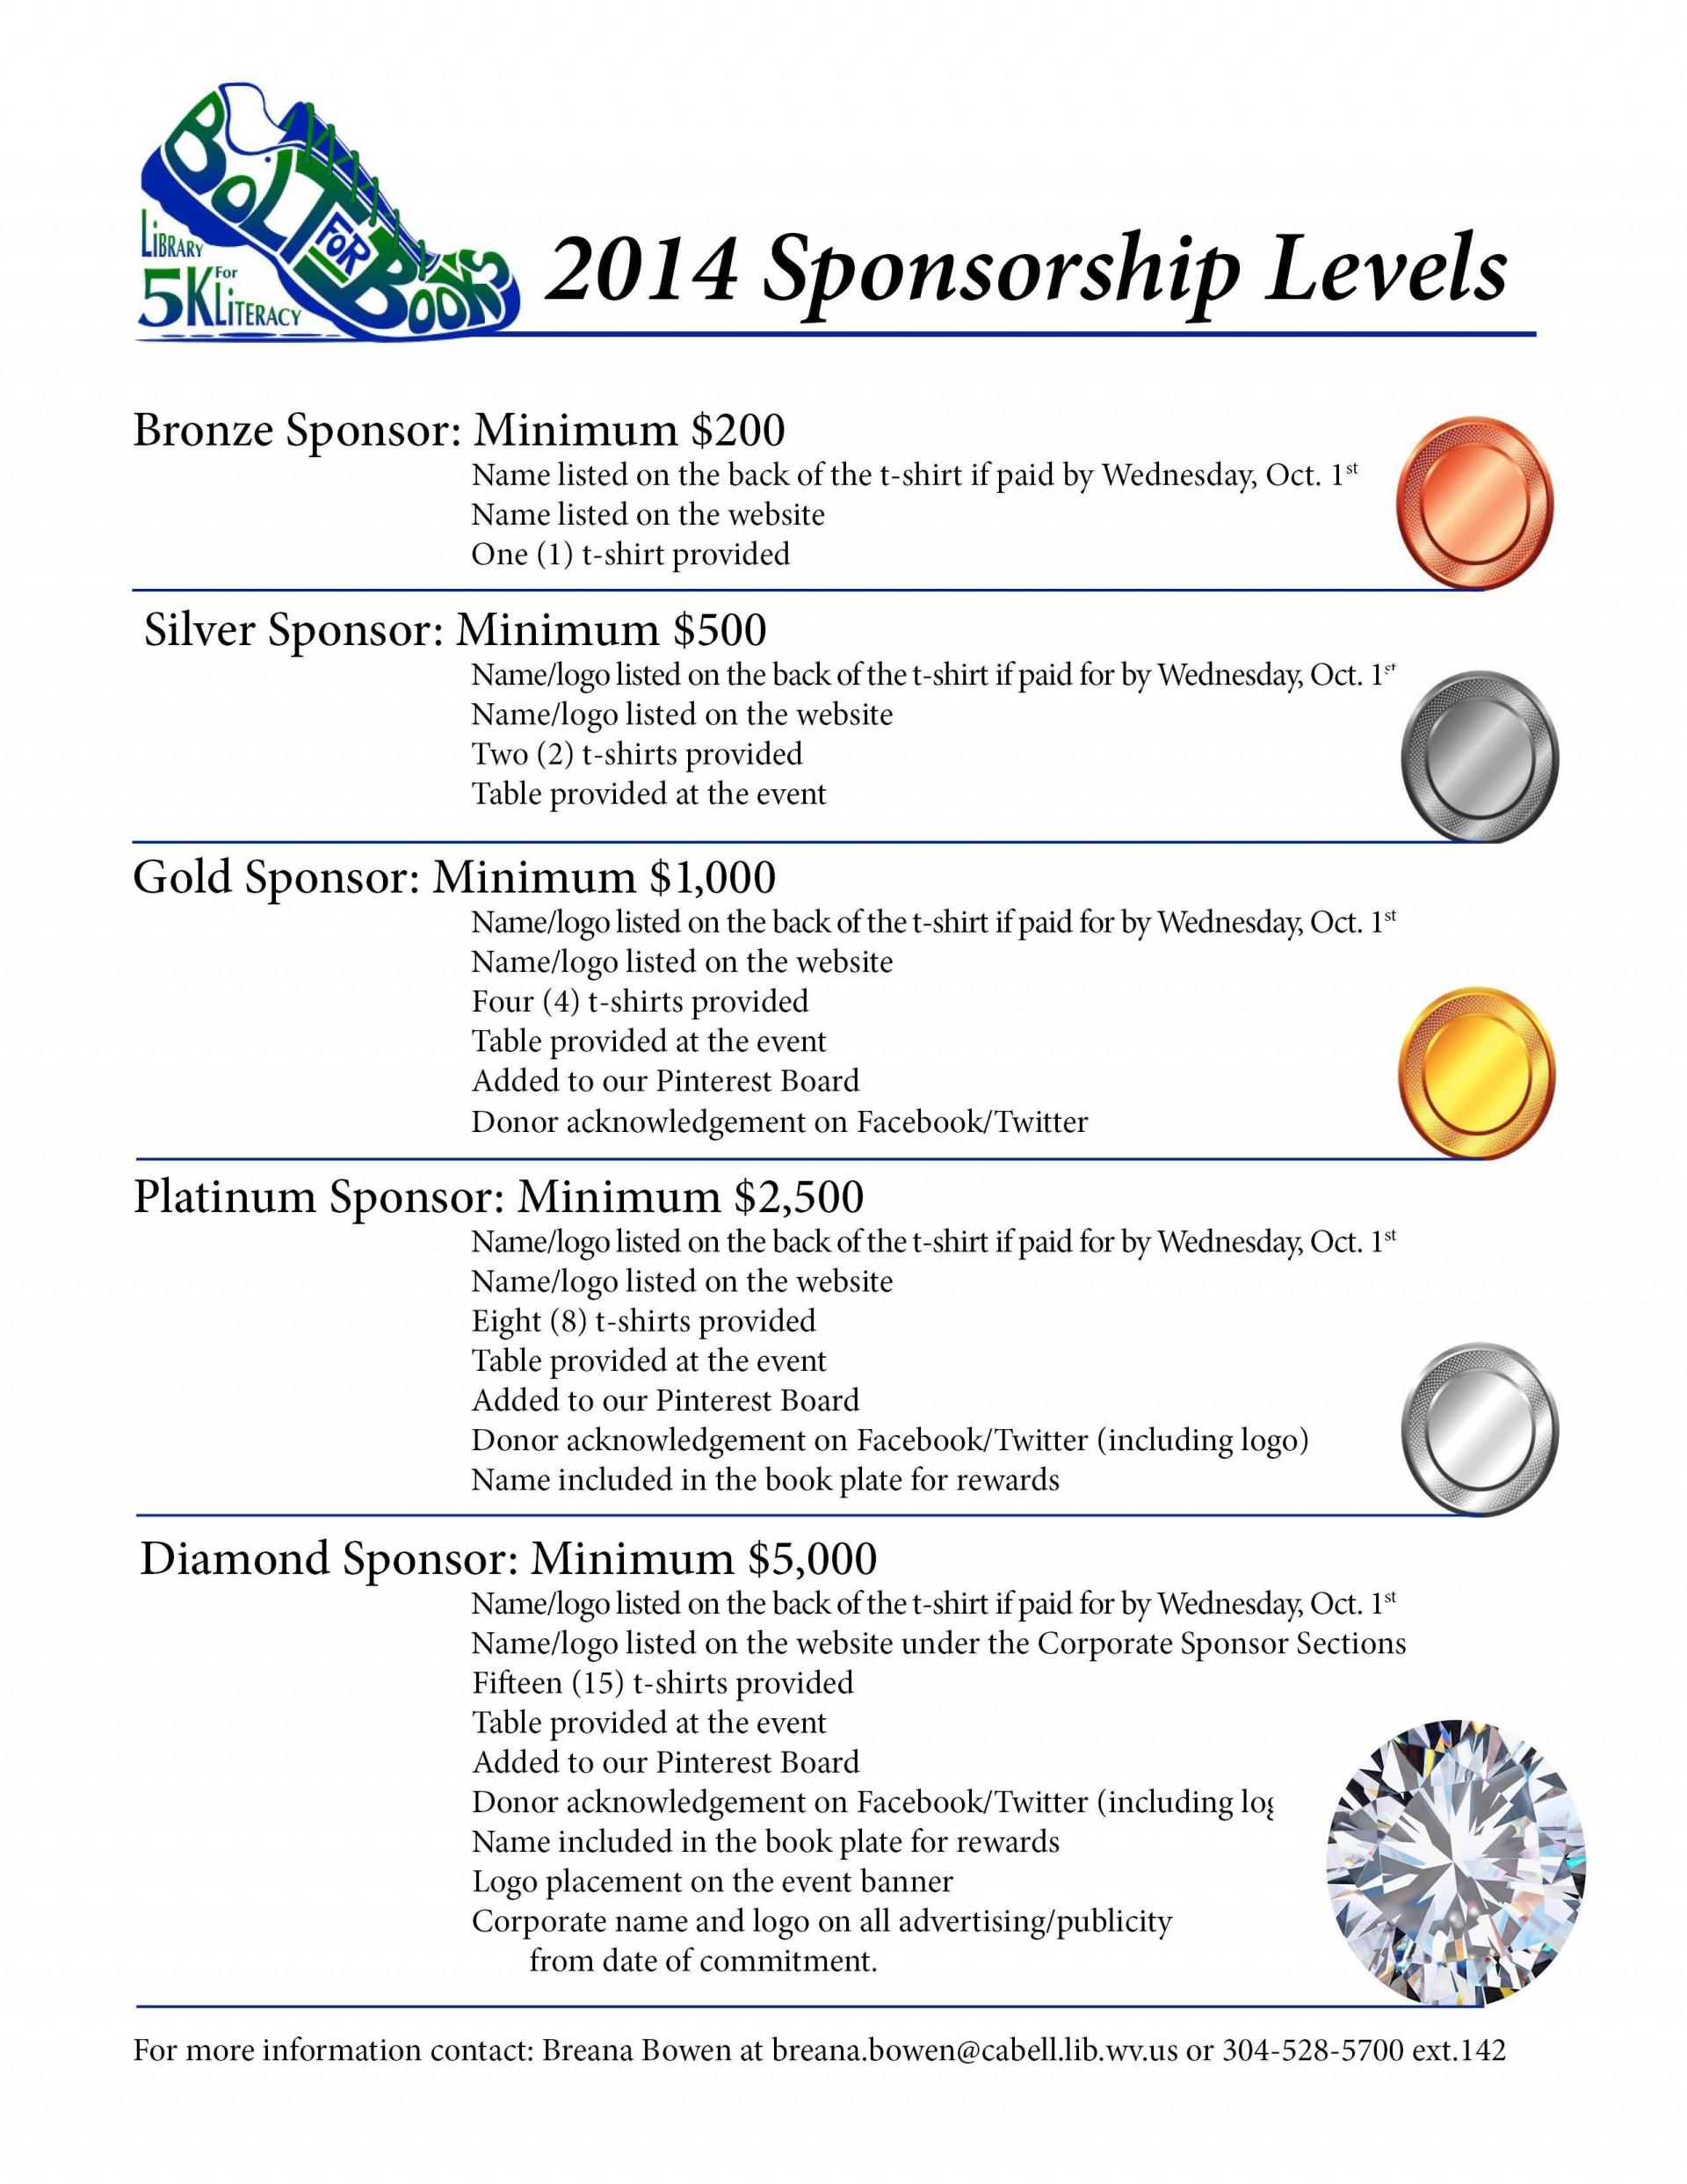 003 Top Event Sponsorship Form Template High Definition  Sponsor Request1920